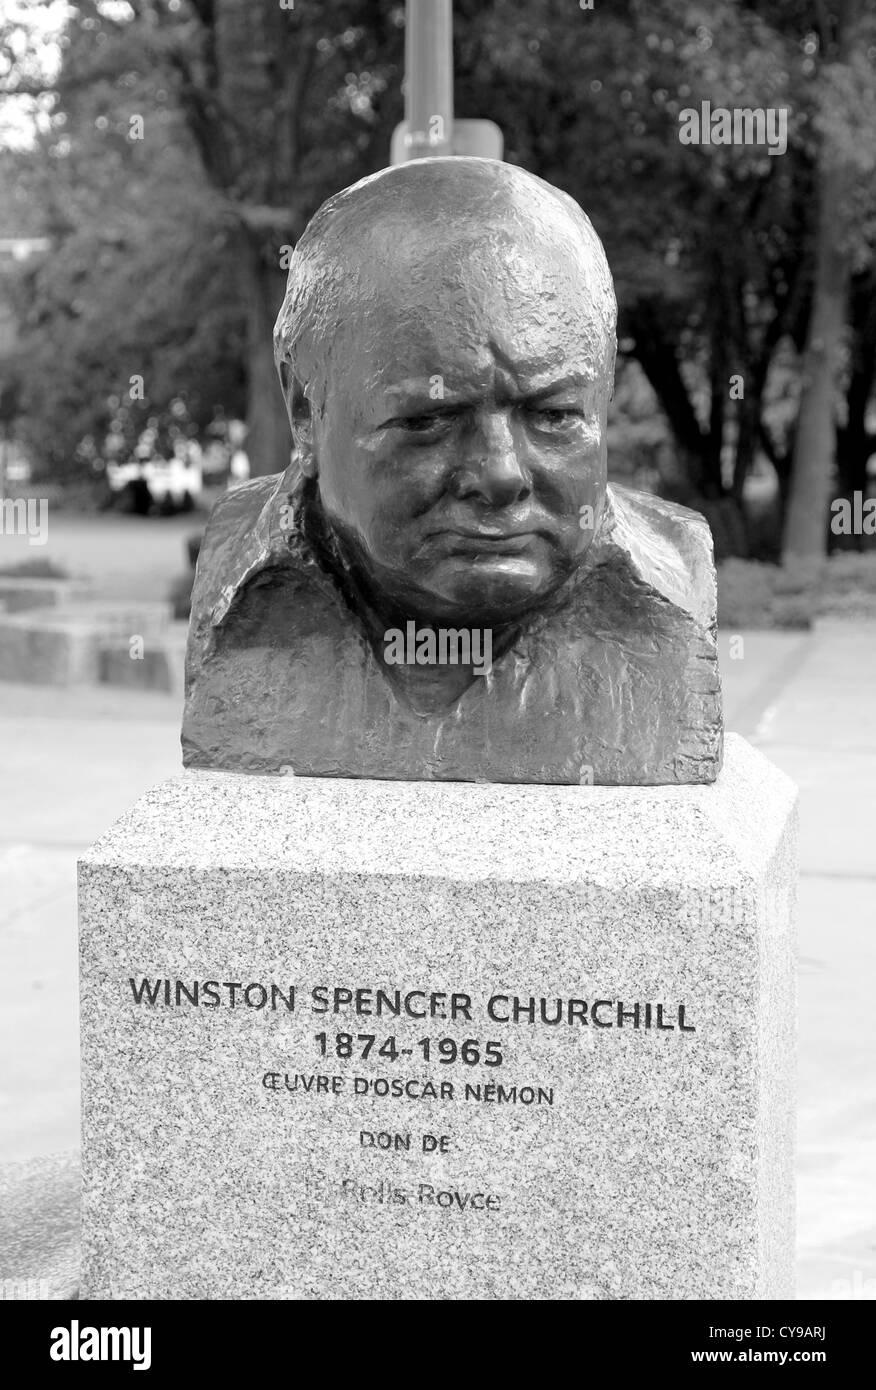 Winston Churchill Statue - Stock Image